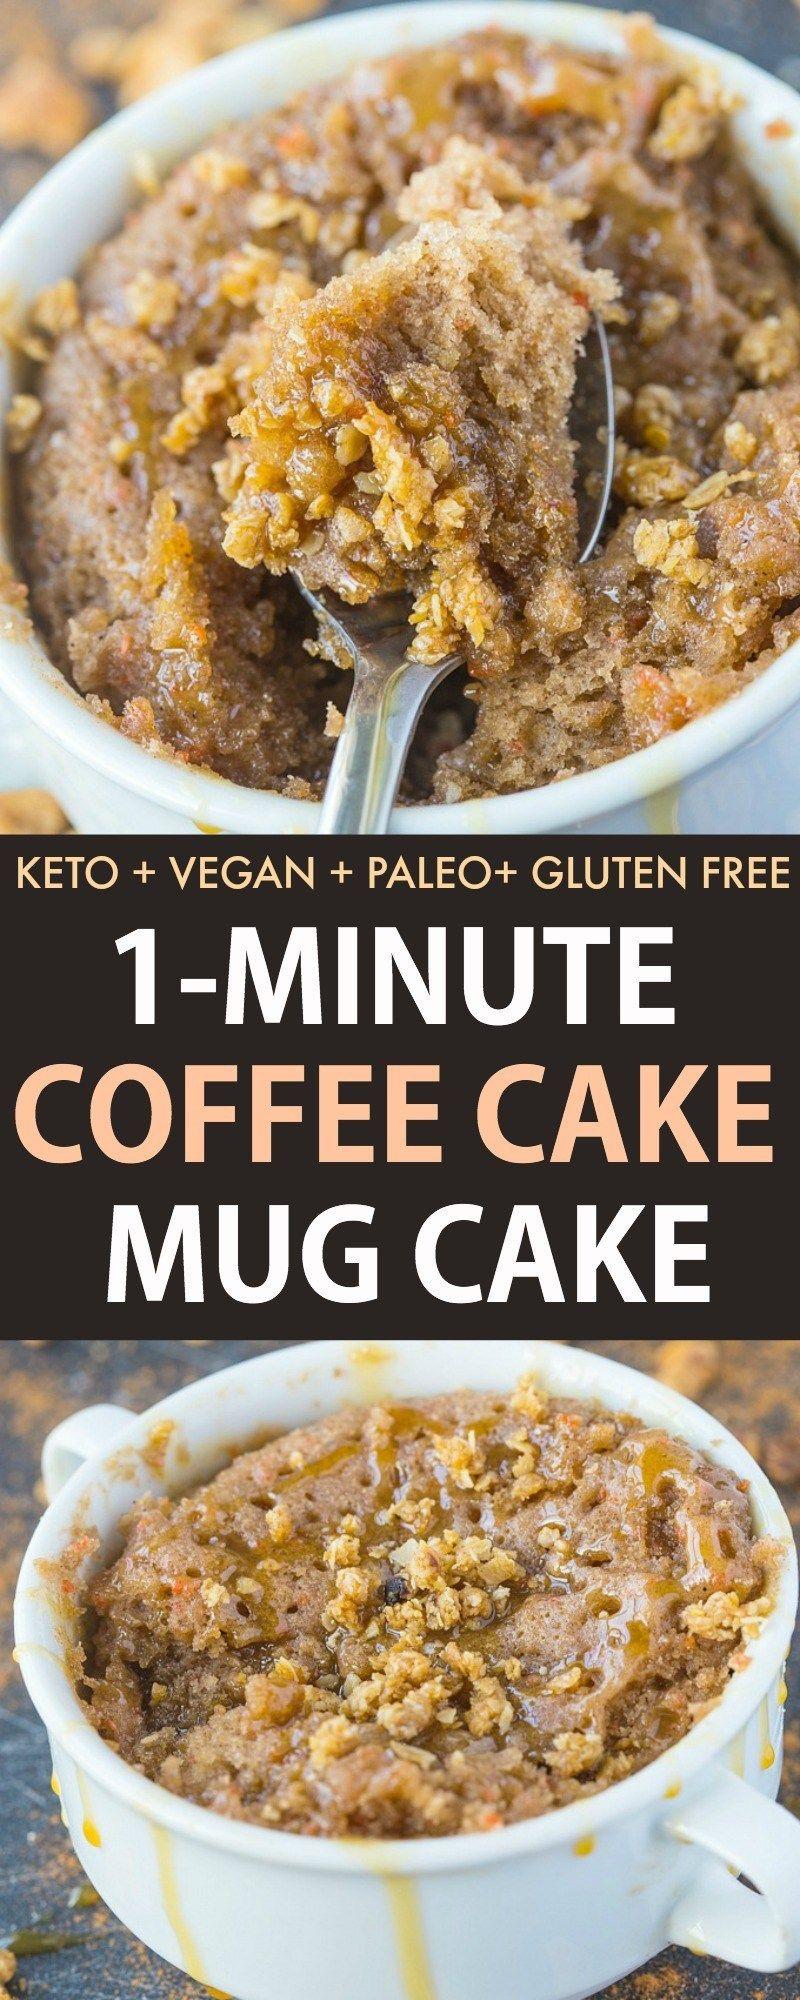 Keto coffee cake mug cake | Recipe | Vegan mug cakes, Mug ...